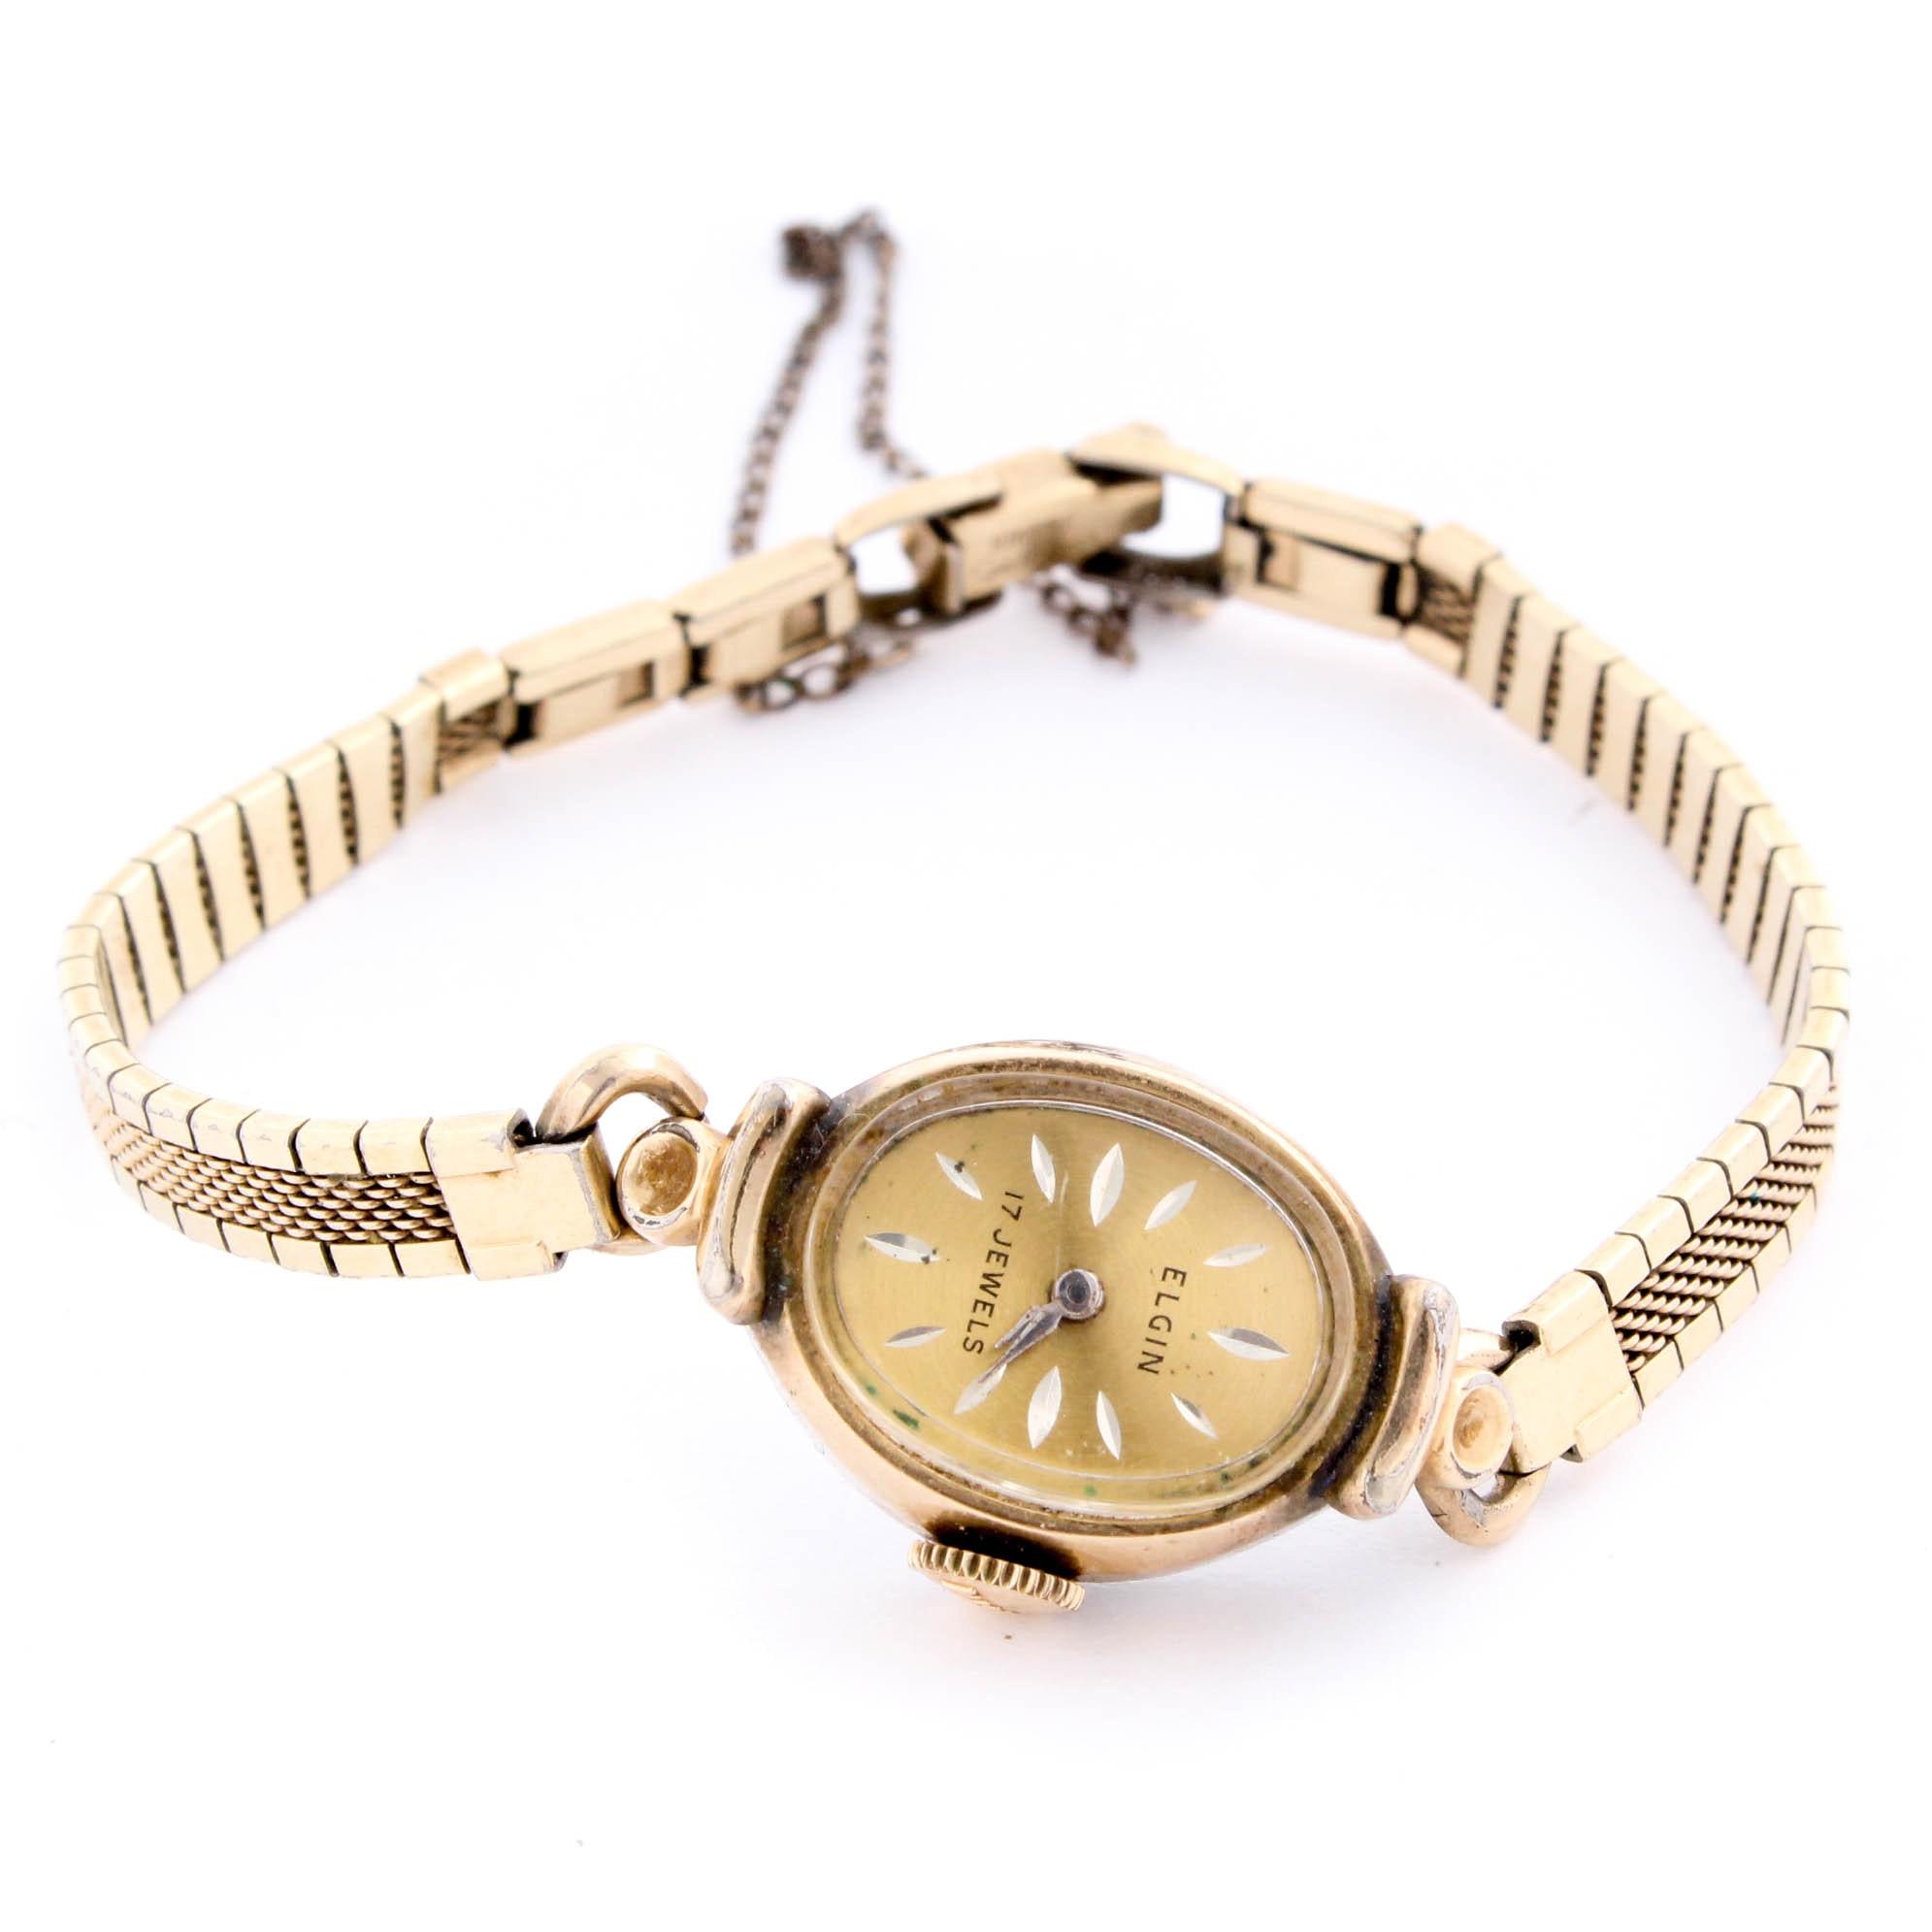 Vintage Elgin 10K Gold Plated Wristwatch